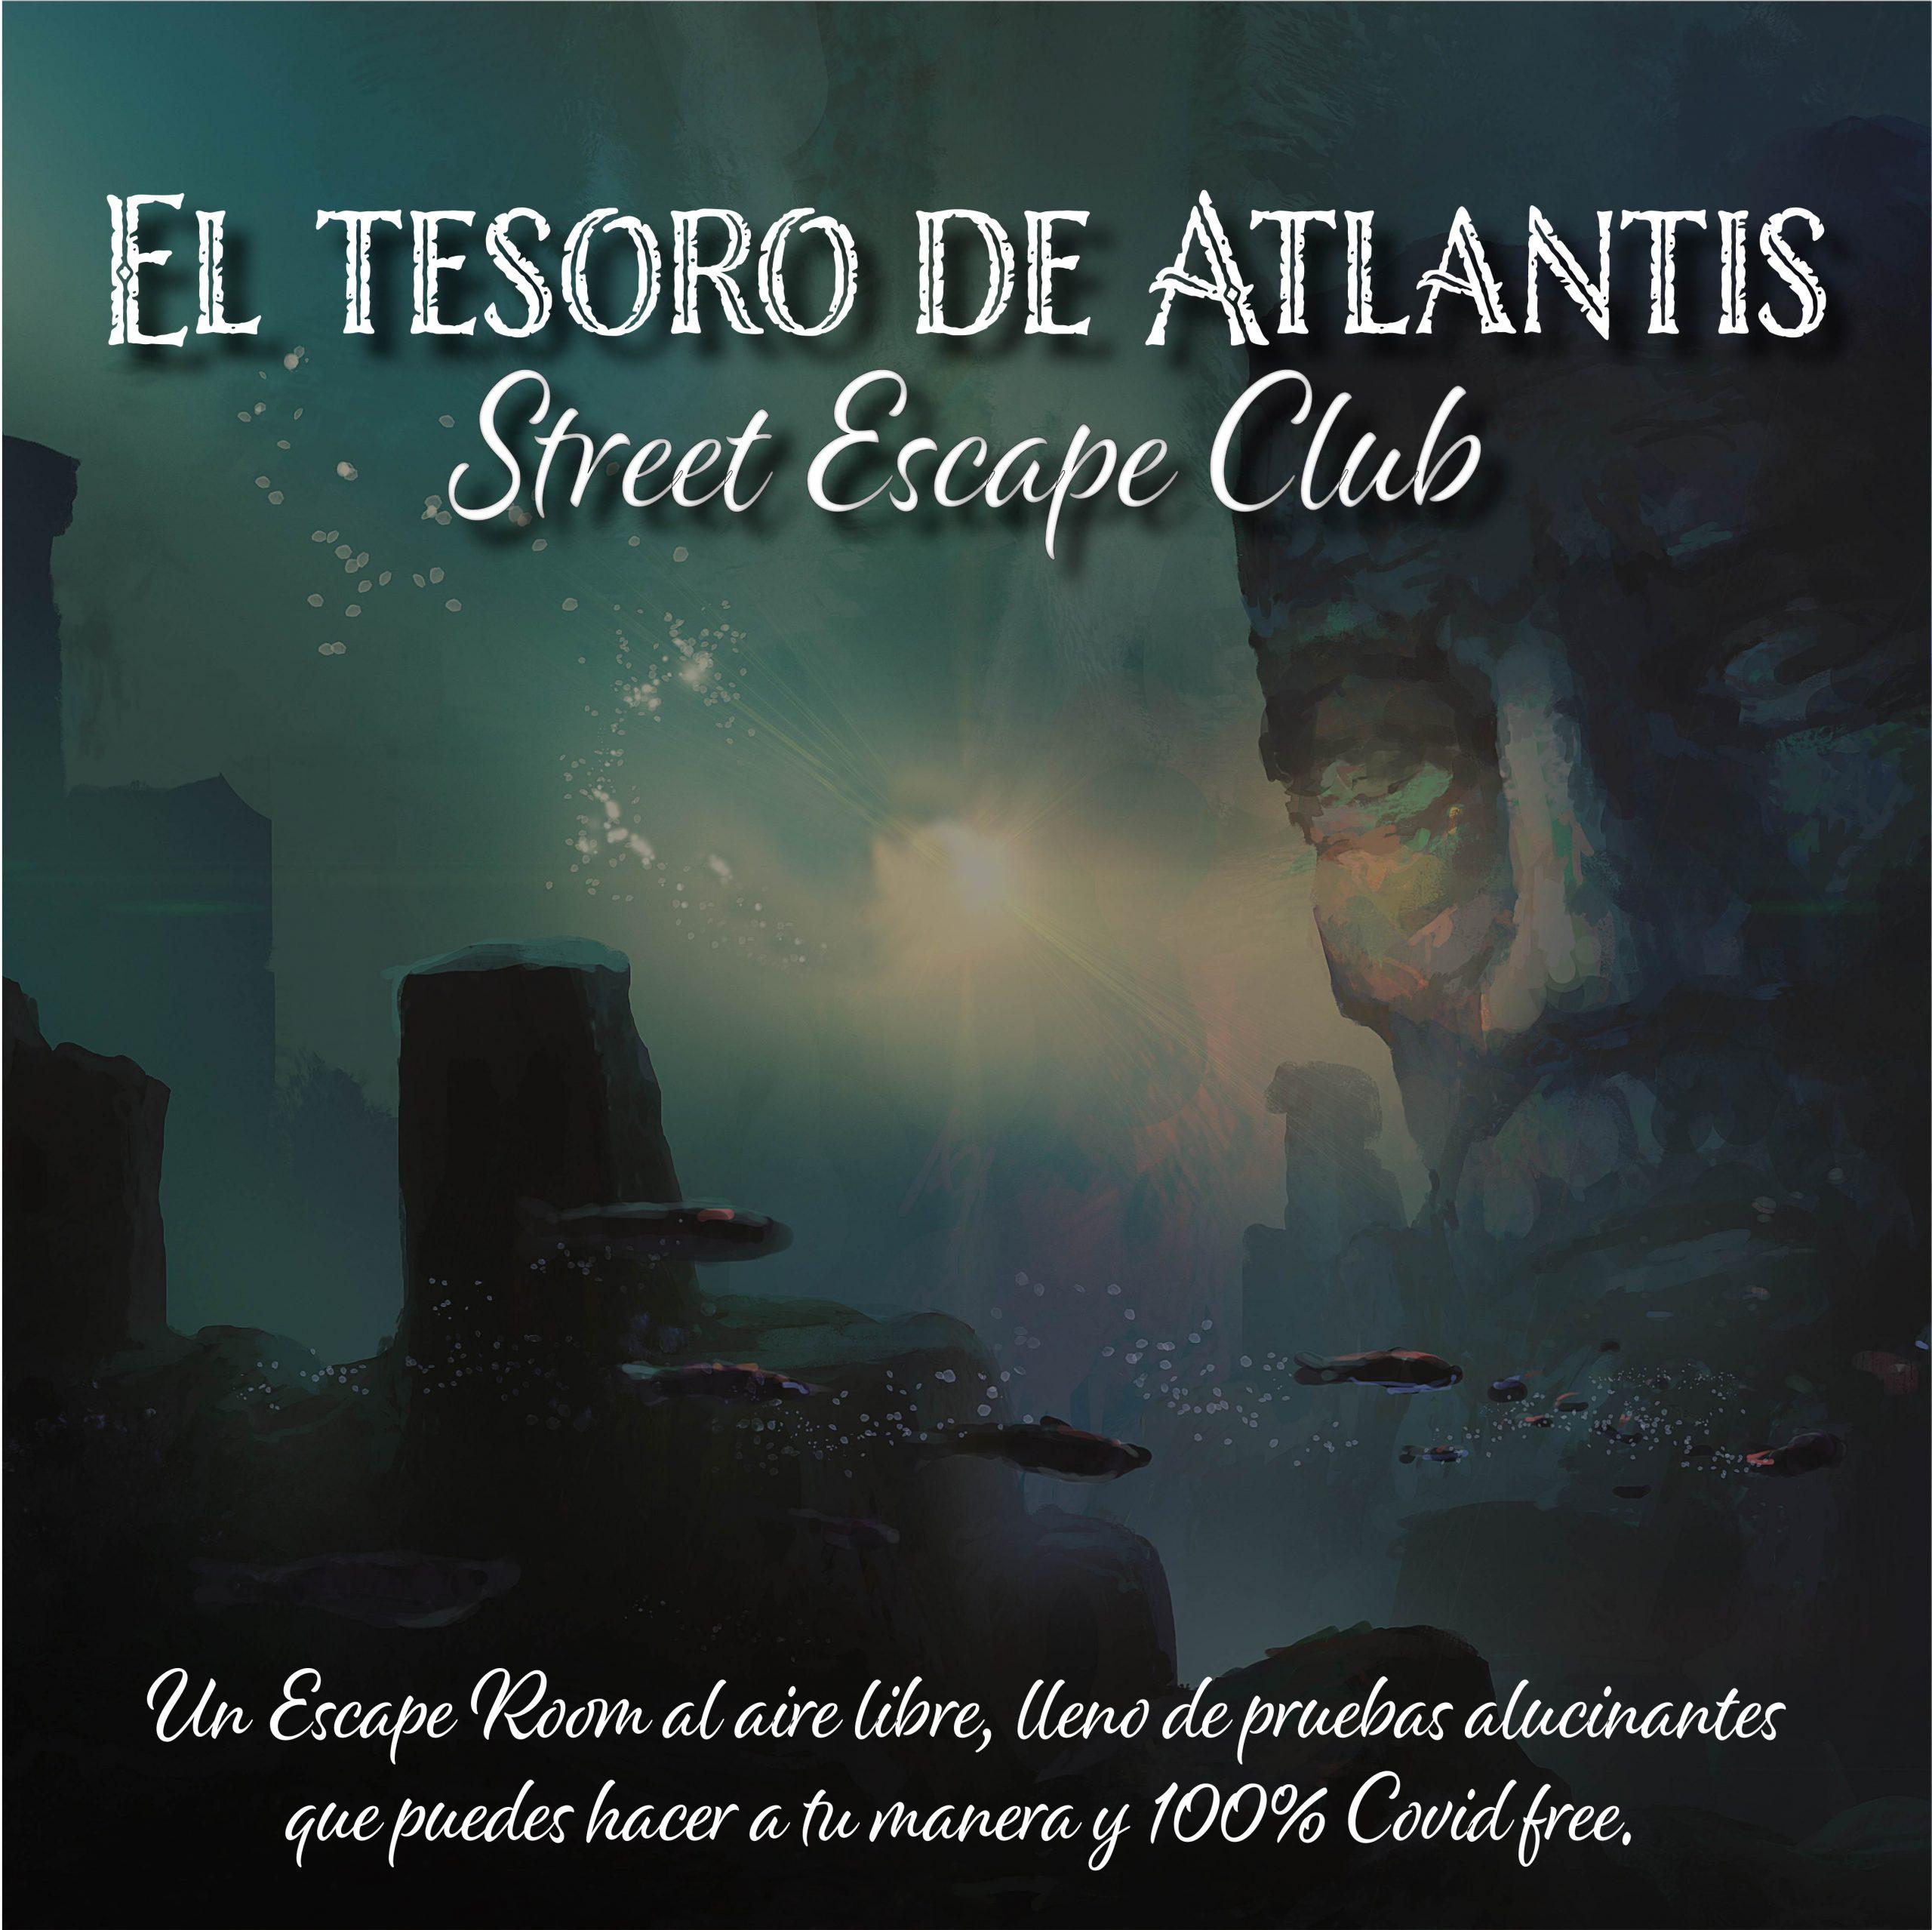 El tesoro de Atlantis Street Escape